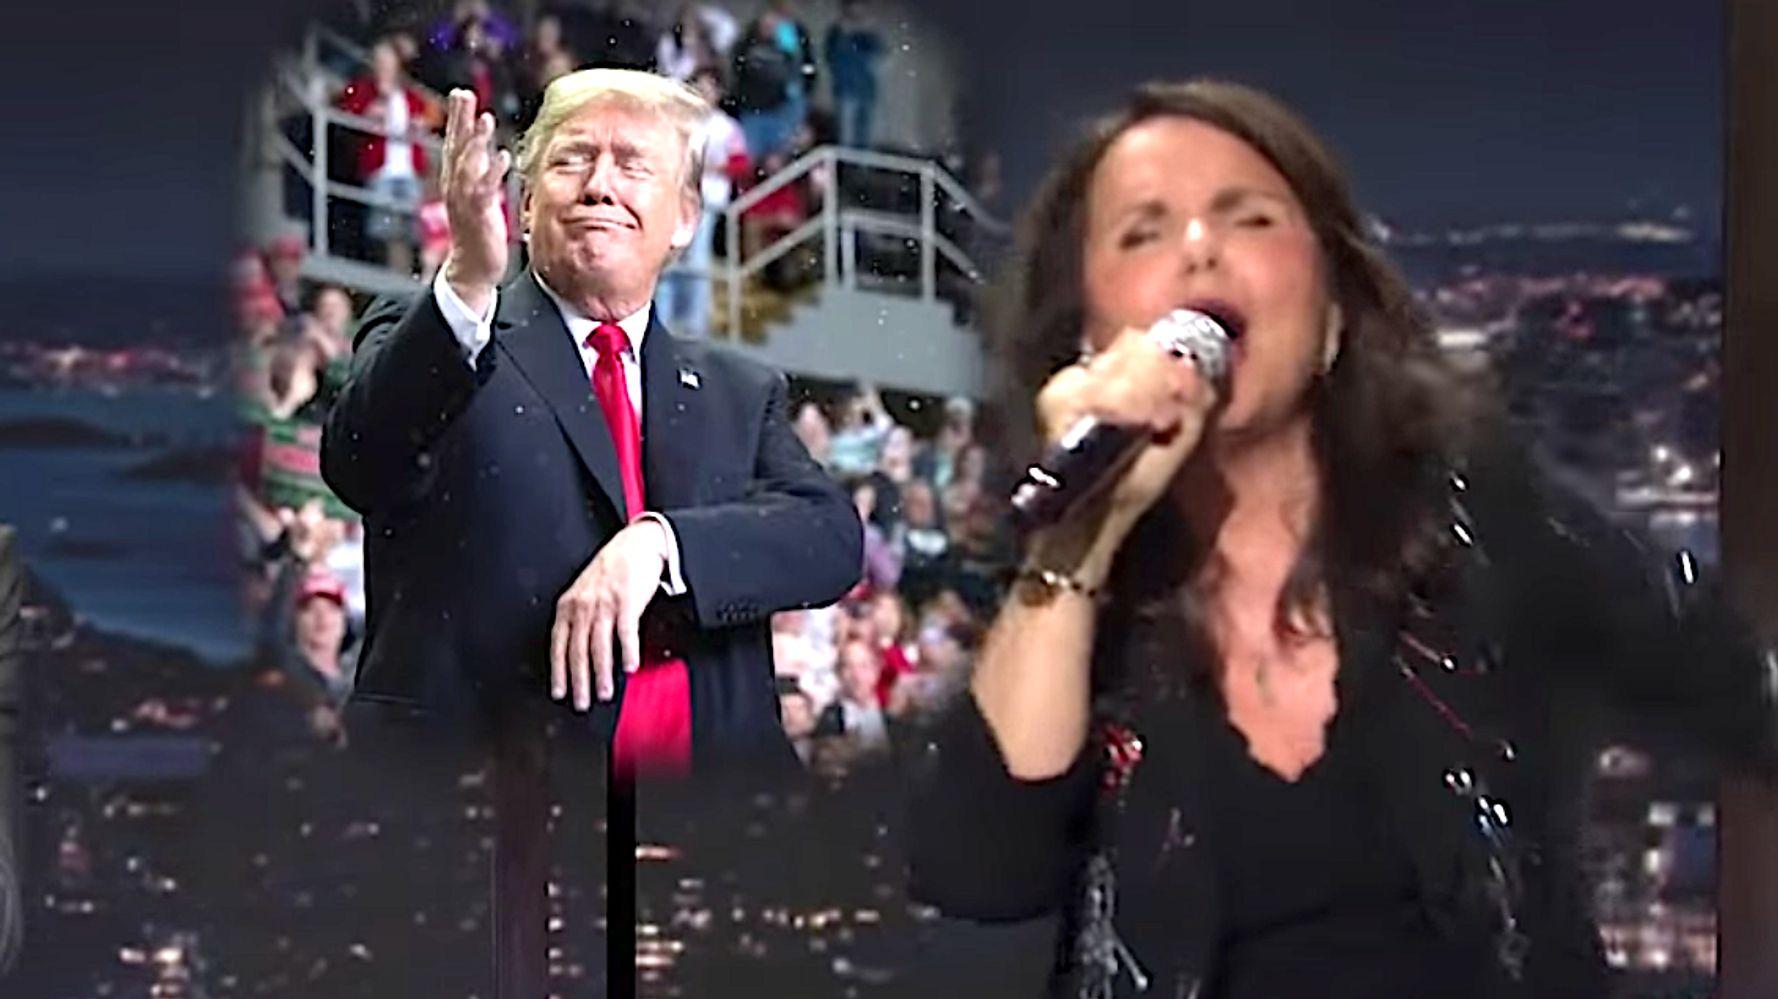 Rocker Patty Smyth Sings 'Goodbye To You' To Donald Trump